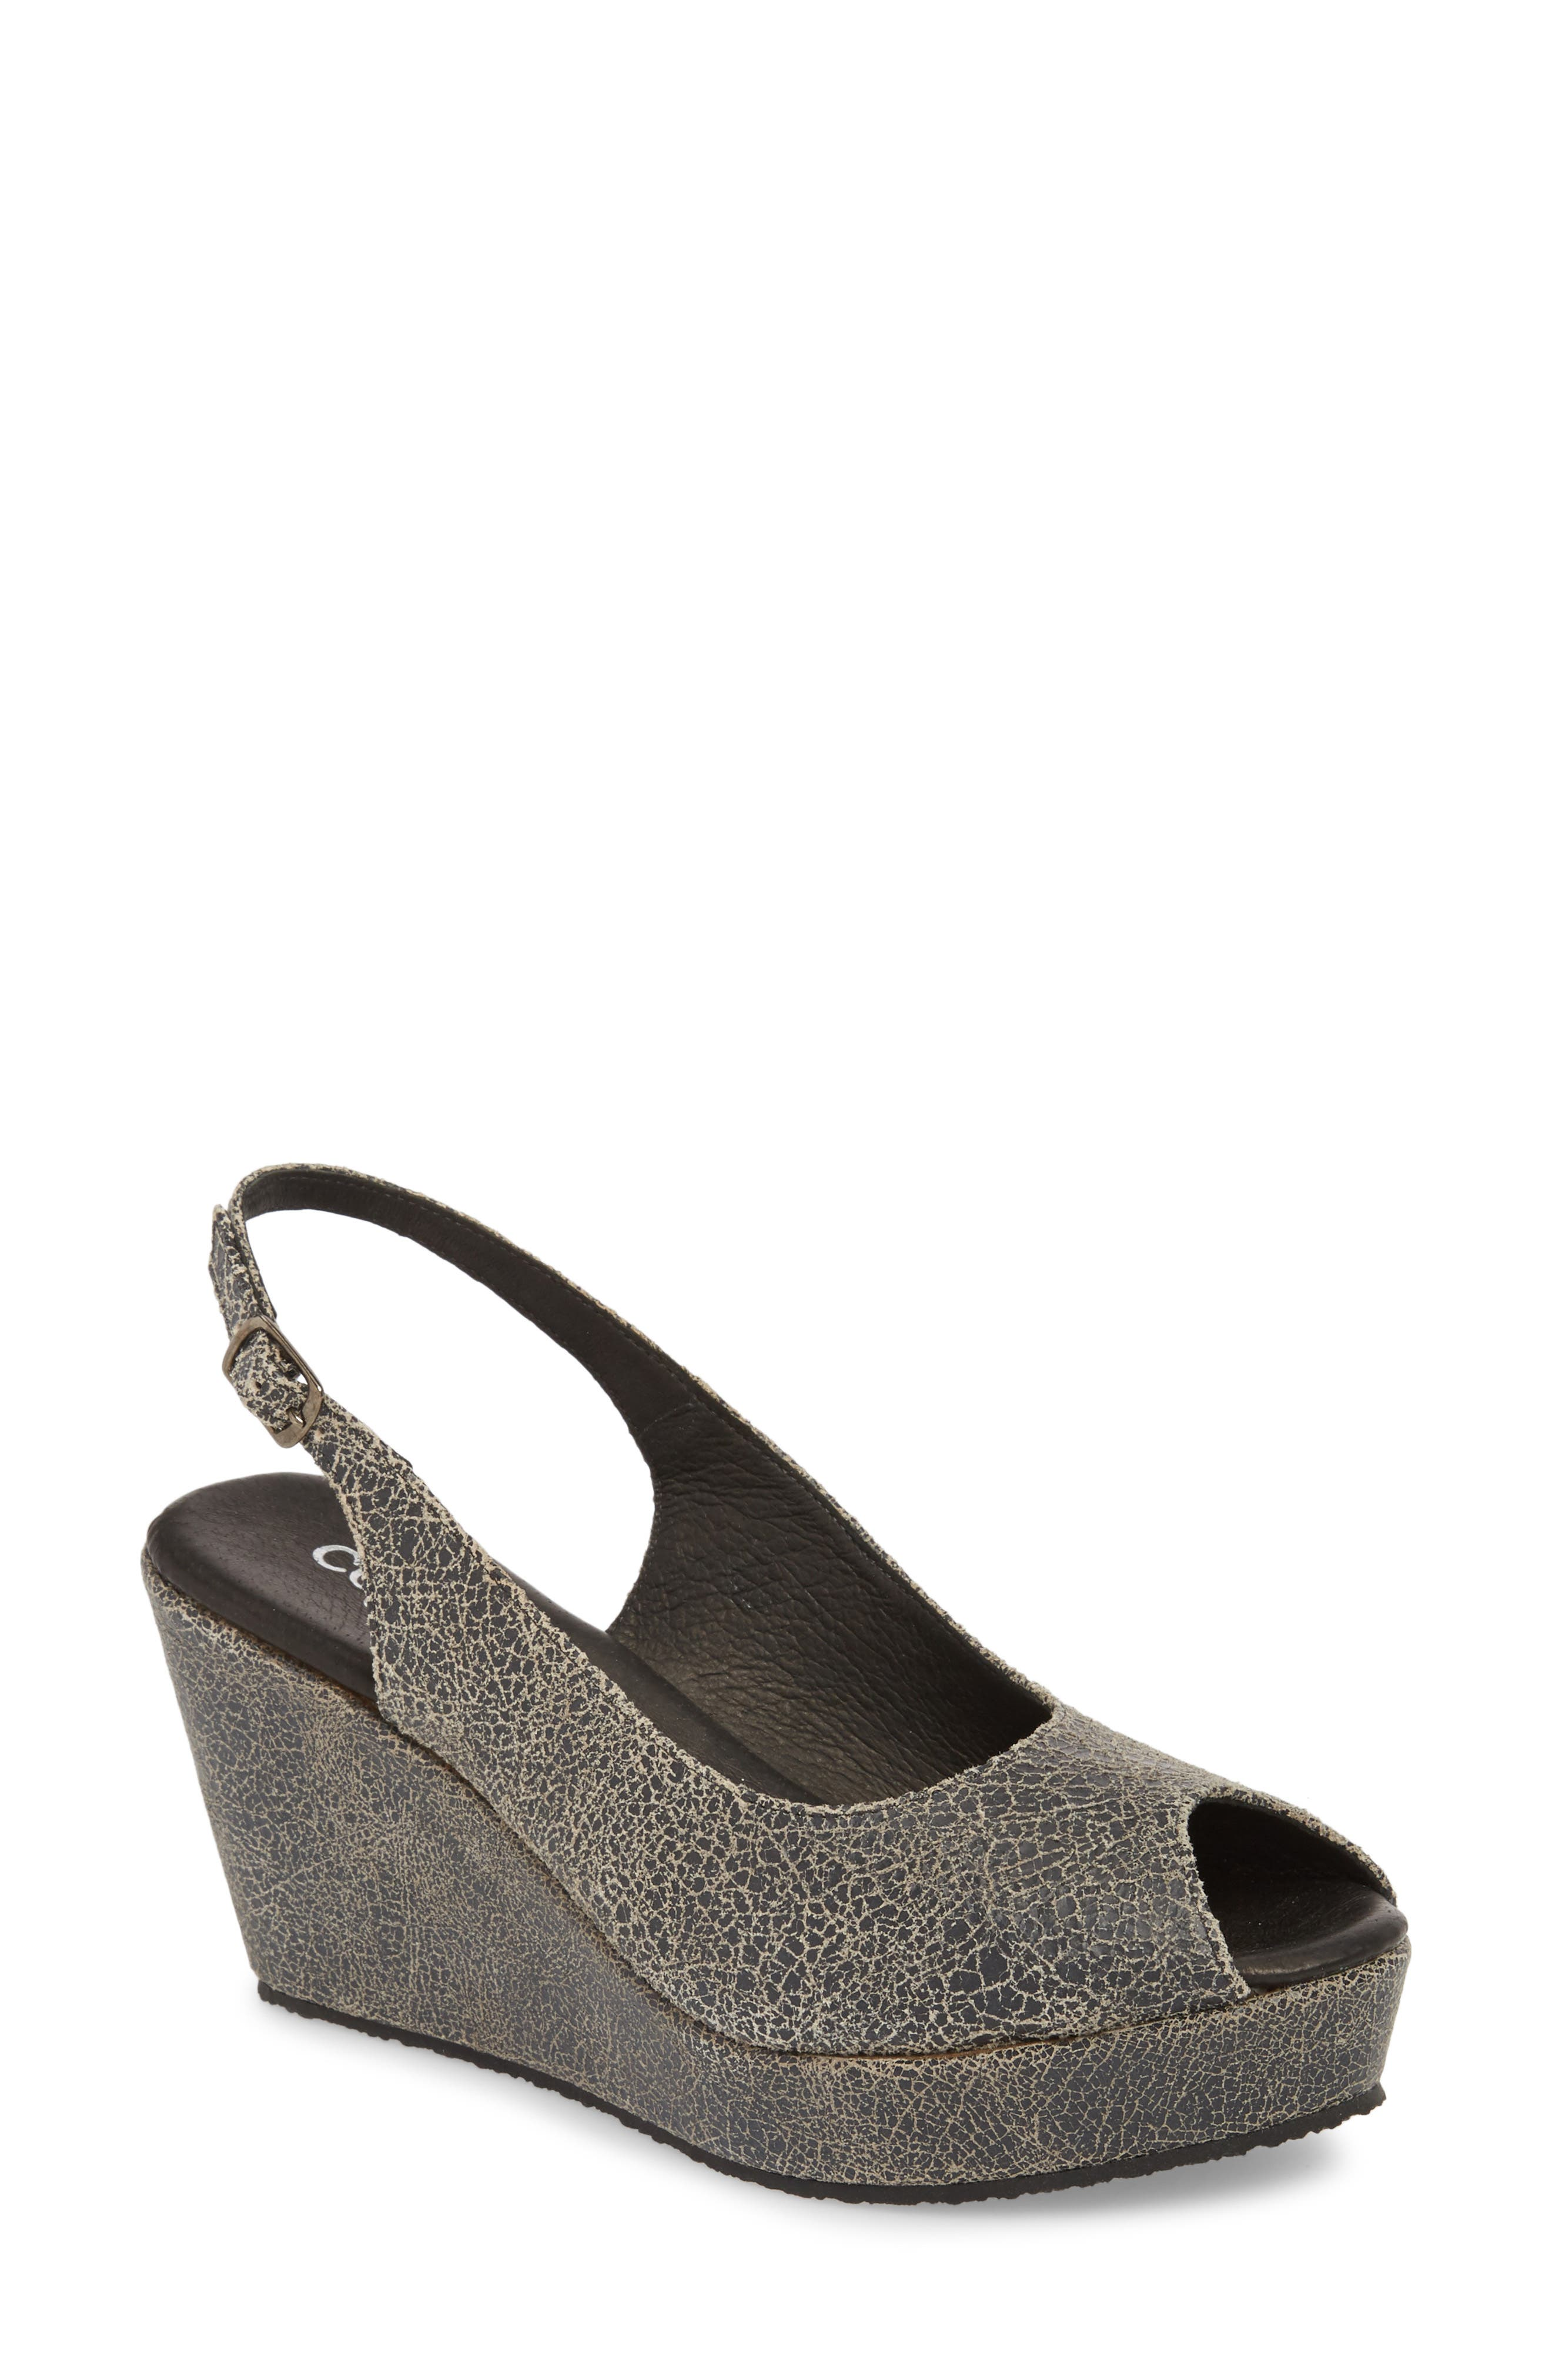 Fabrice Slingback Platform Sandal,                             Main thumbnail 1, color,                             Grey Crackle Leather